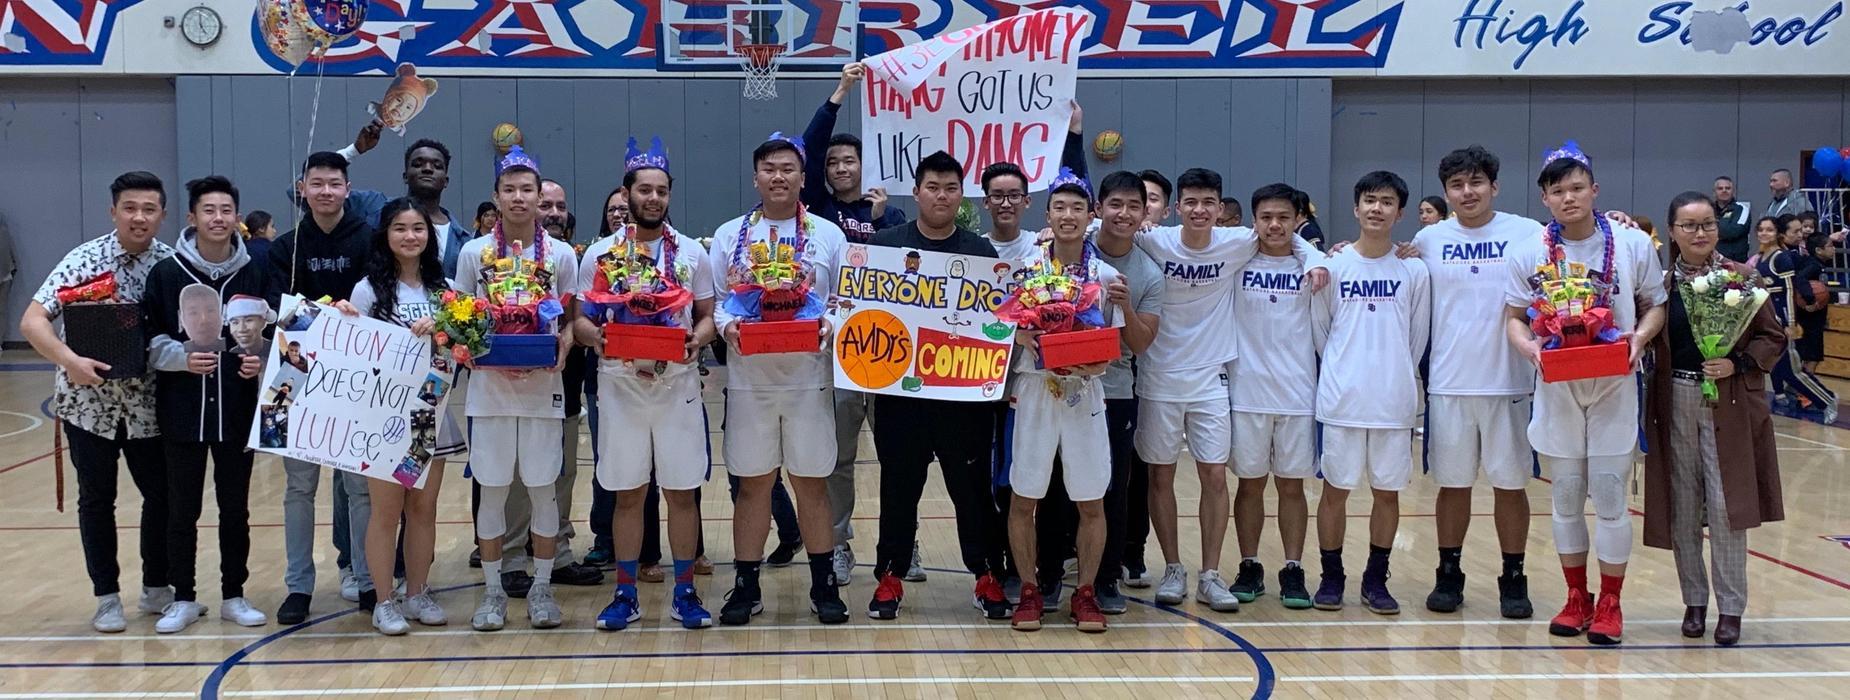 Matador Baskeball Team with Friends and Family